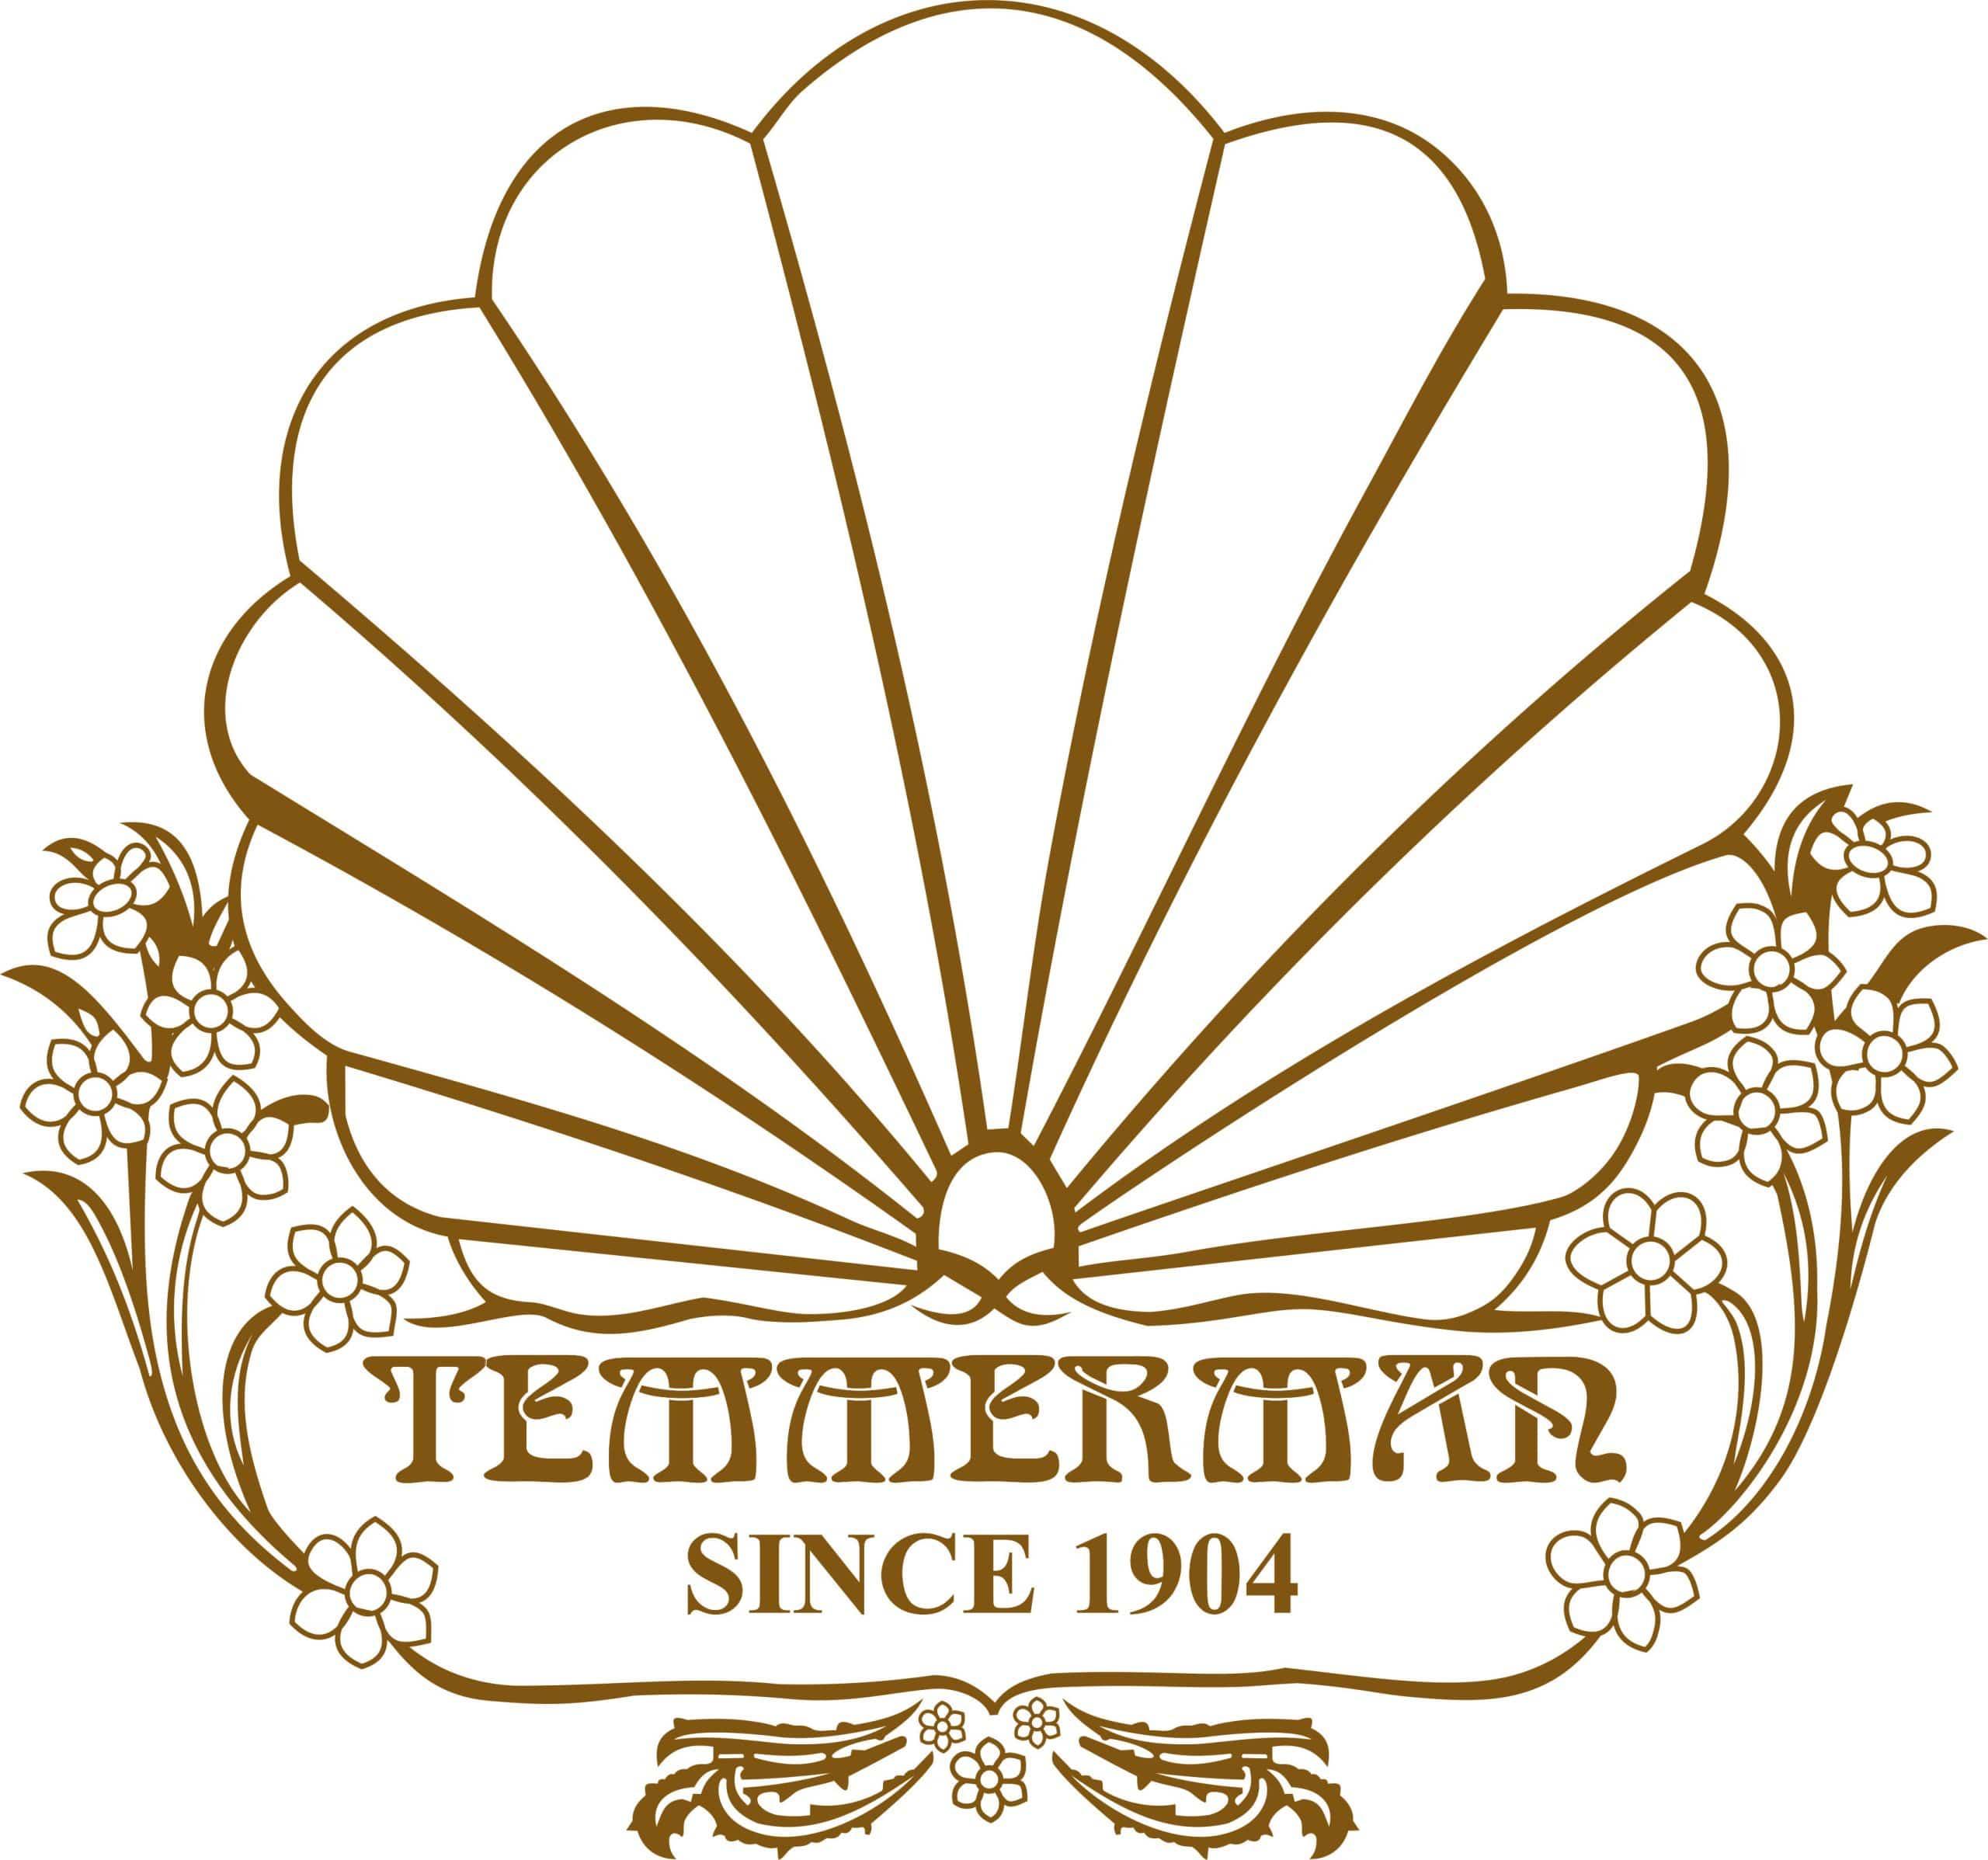 TEMMERMAN CONFISERIE - 1904